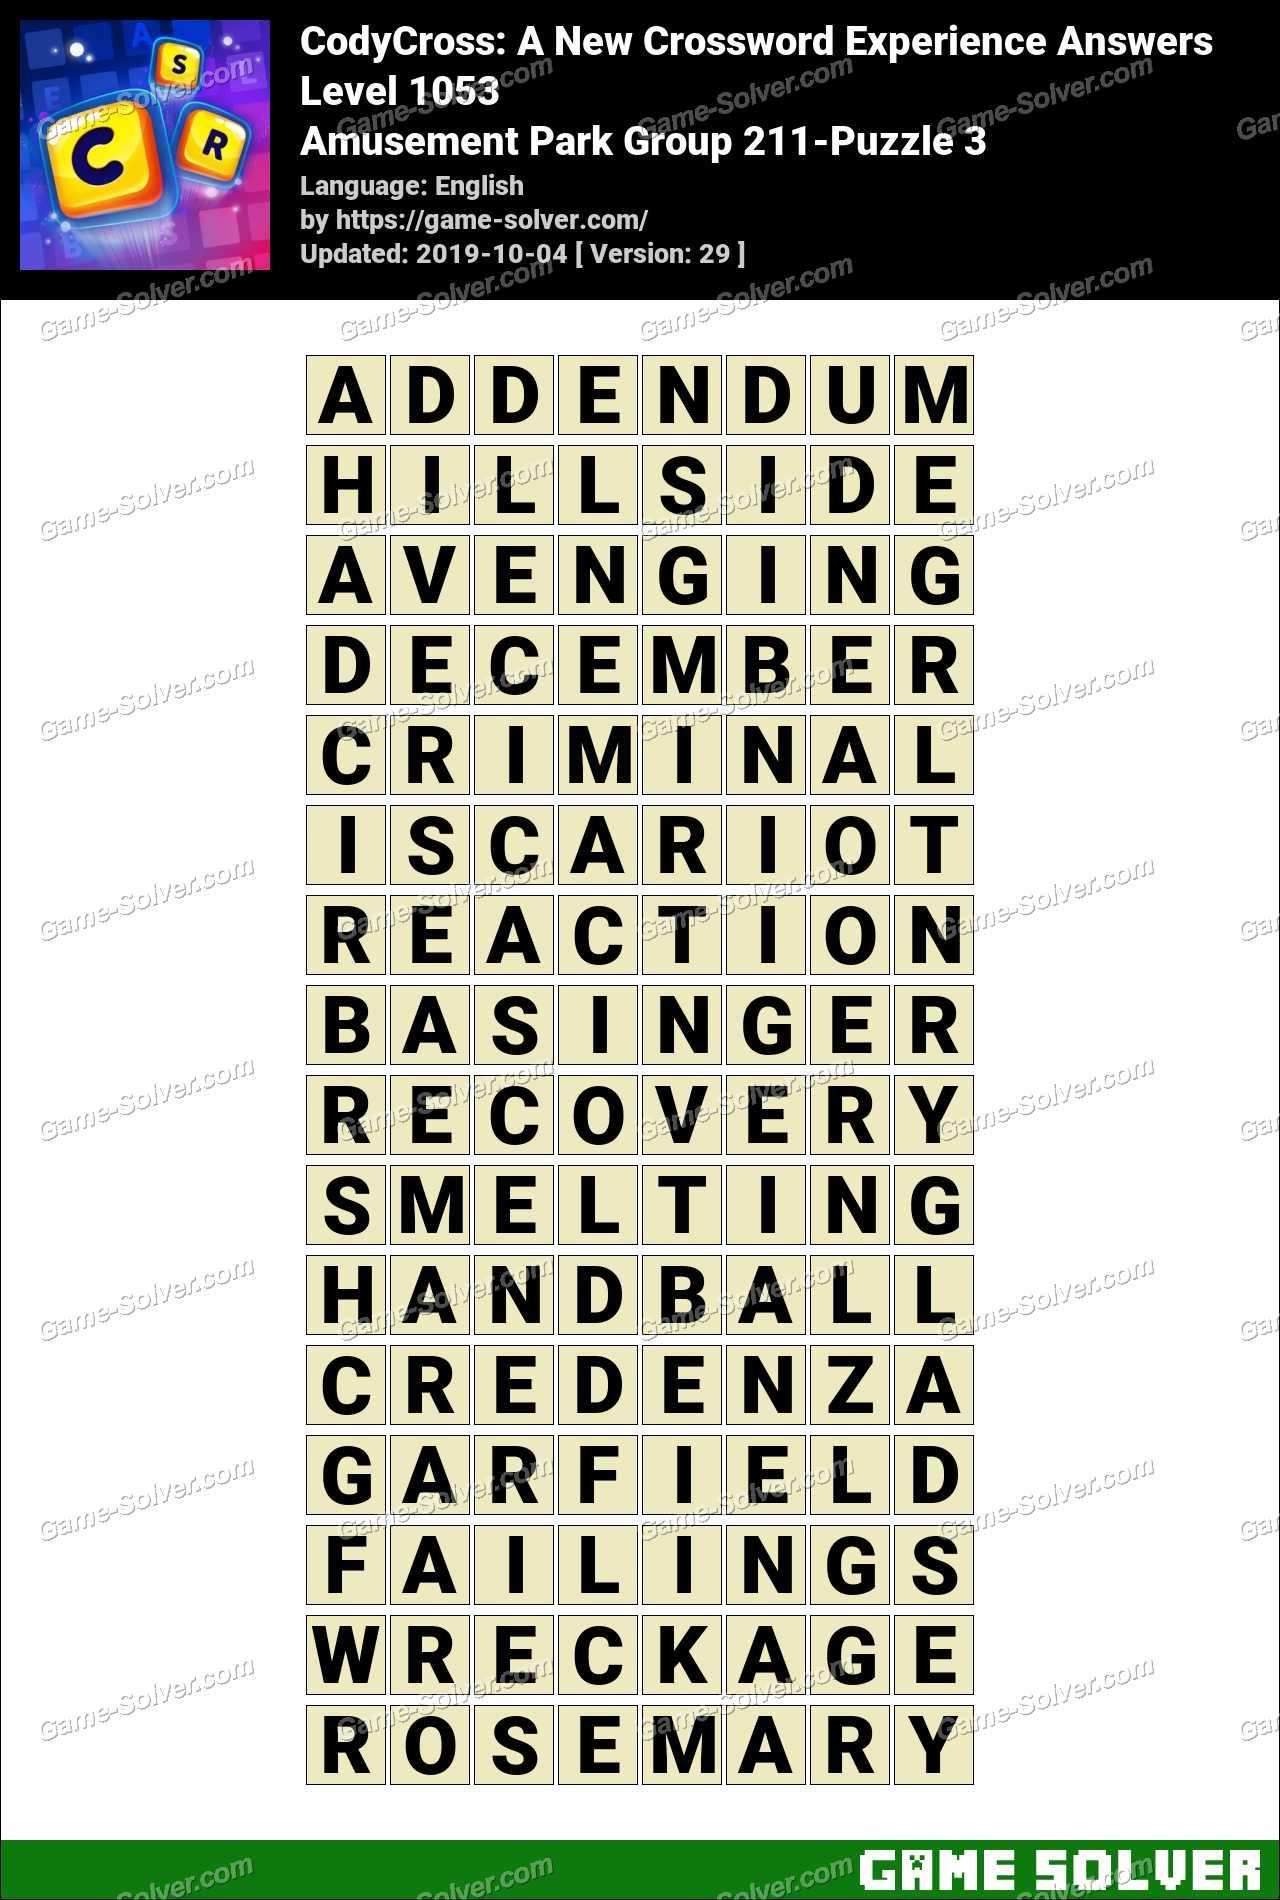 CodyCross Amusement Park Group 211-Puzzle 3 Answers